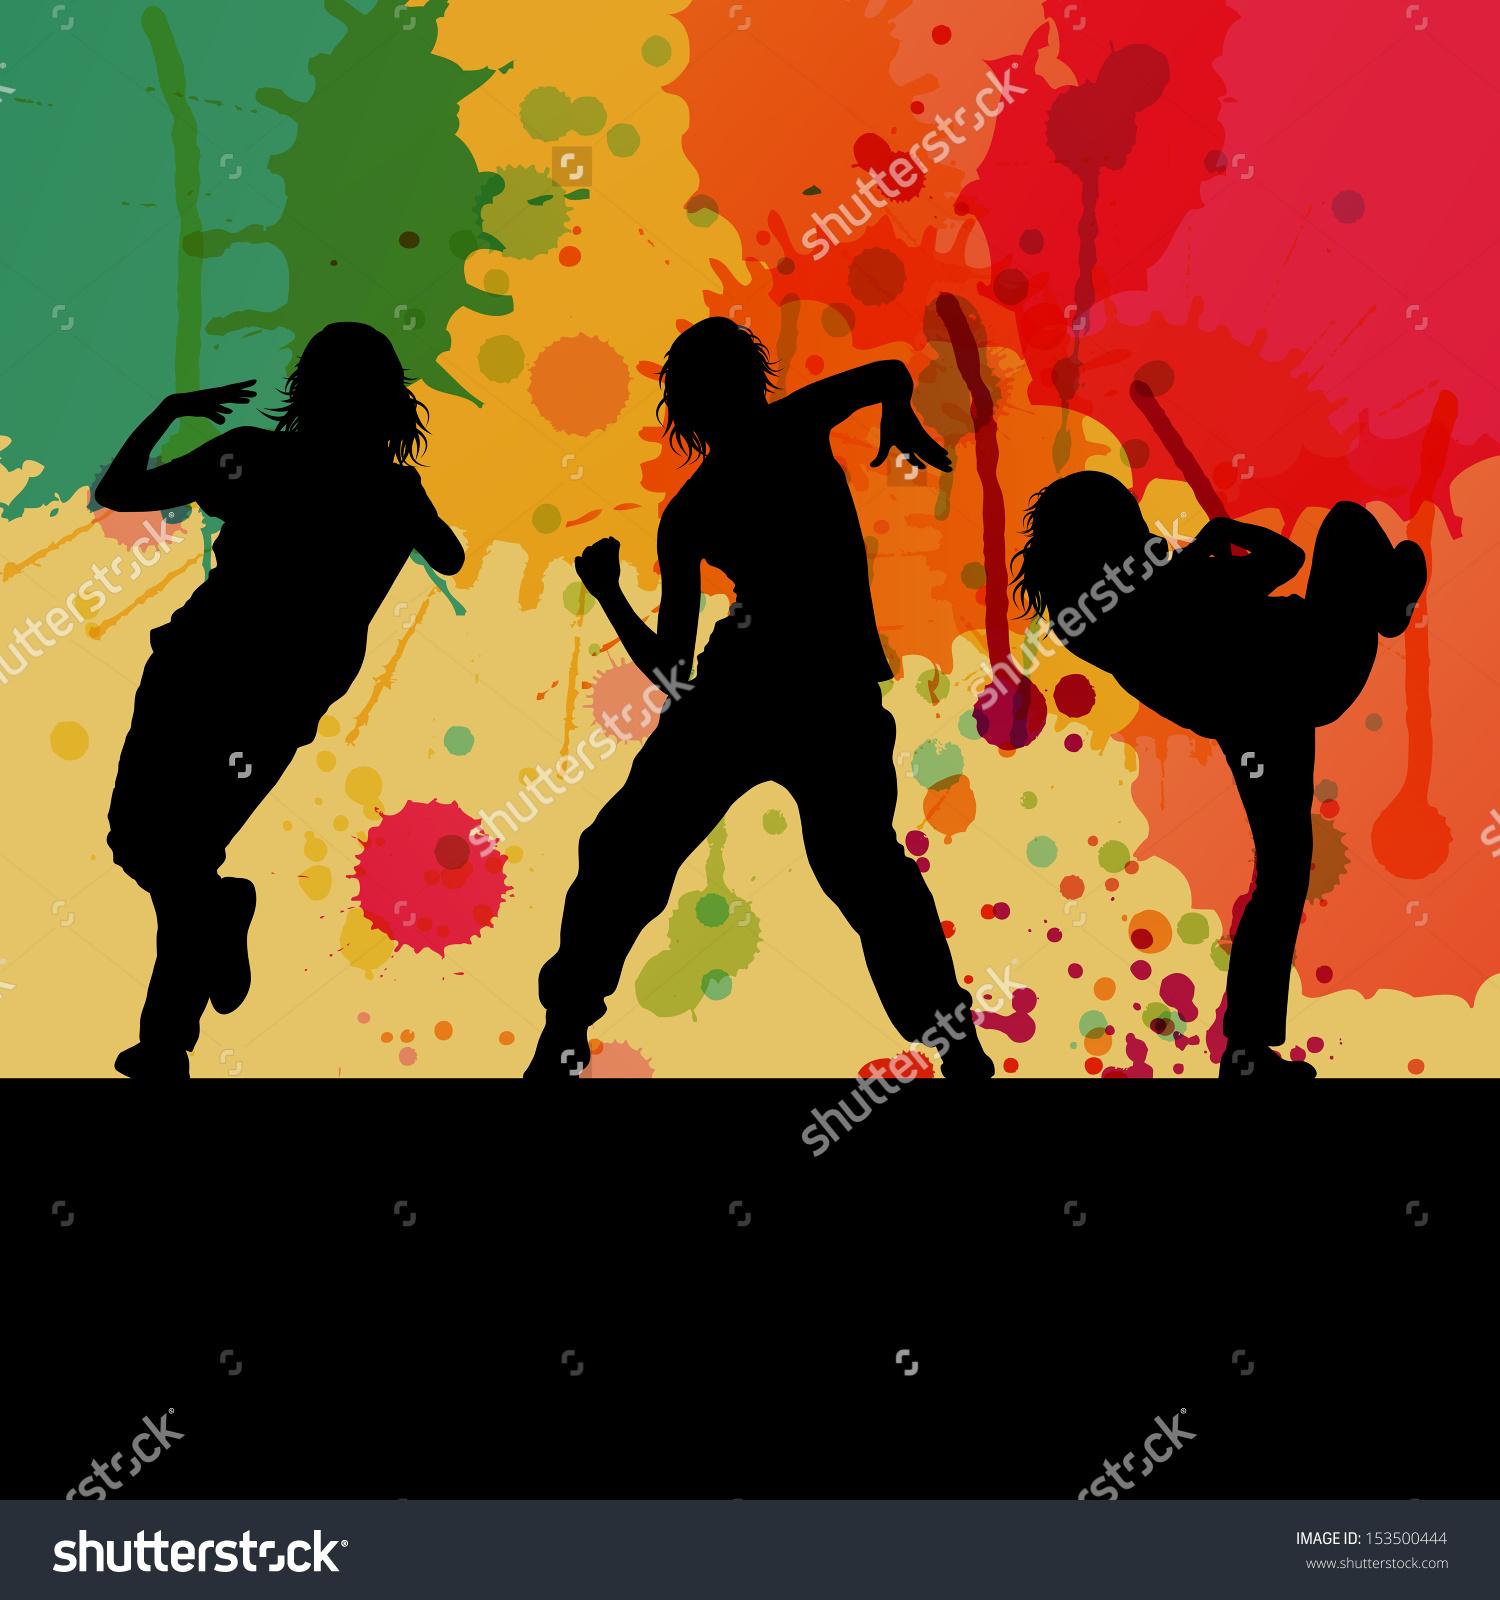 Dancing dancer girl man clipart splash.